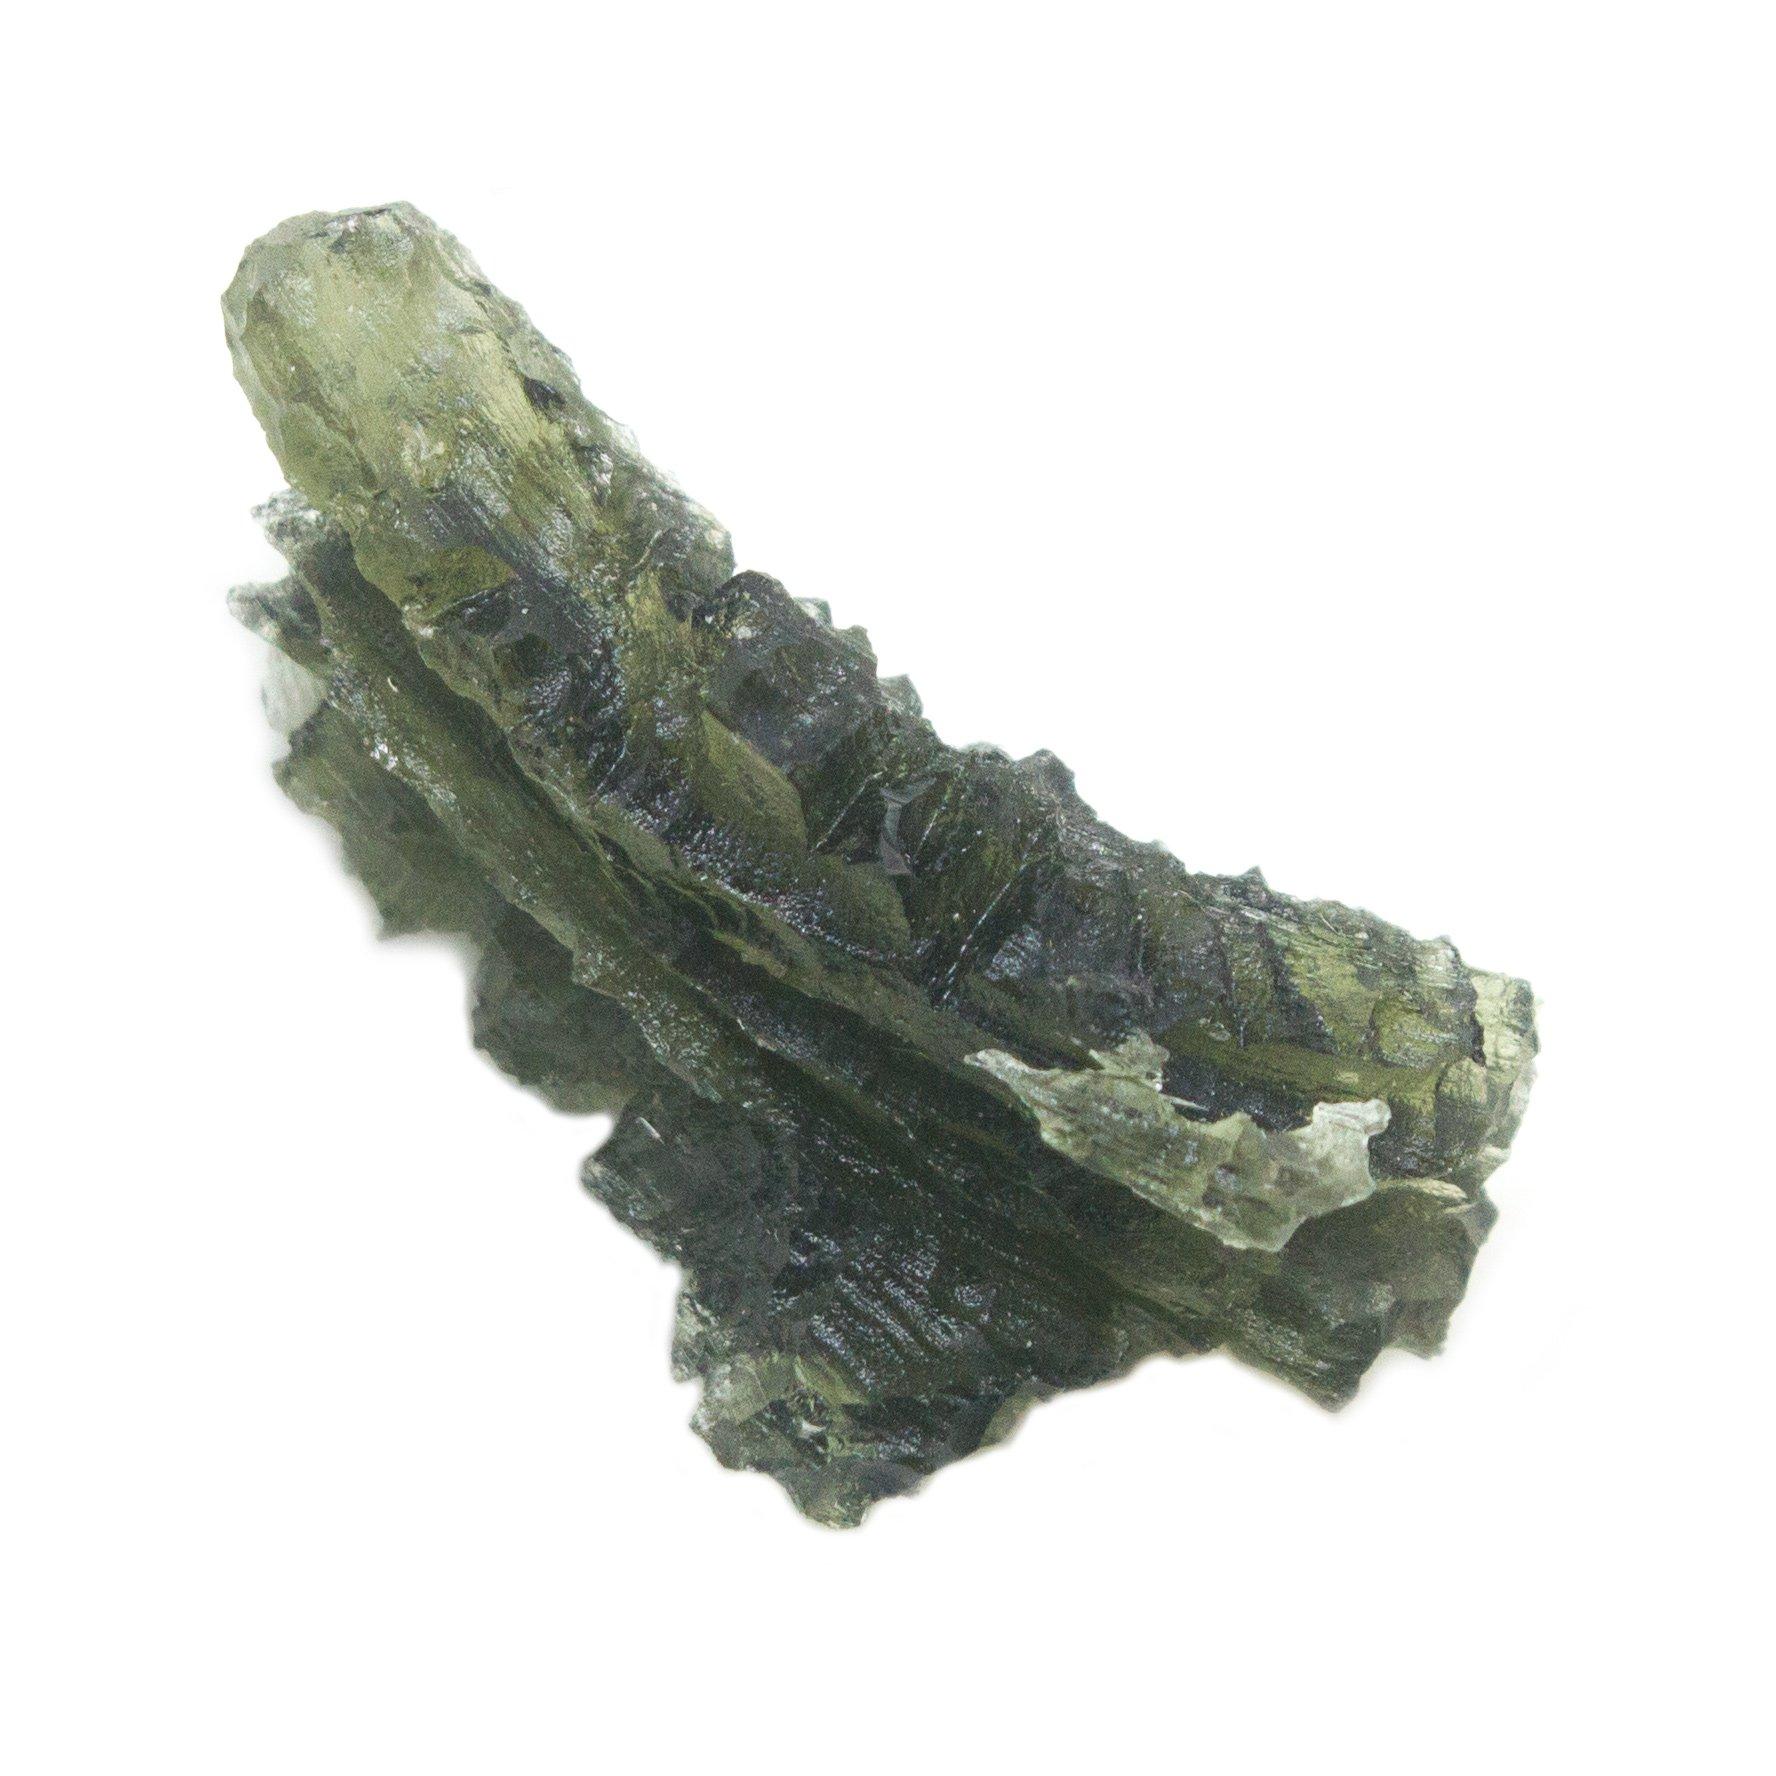 Besednice Moldavite Crystal by Crystal Vaults (Image #2)